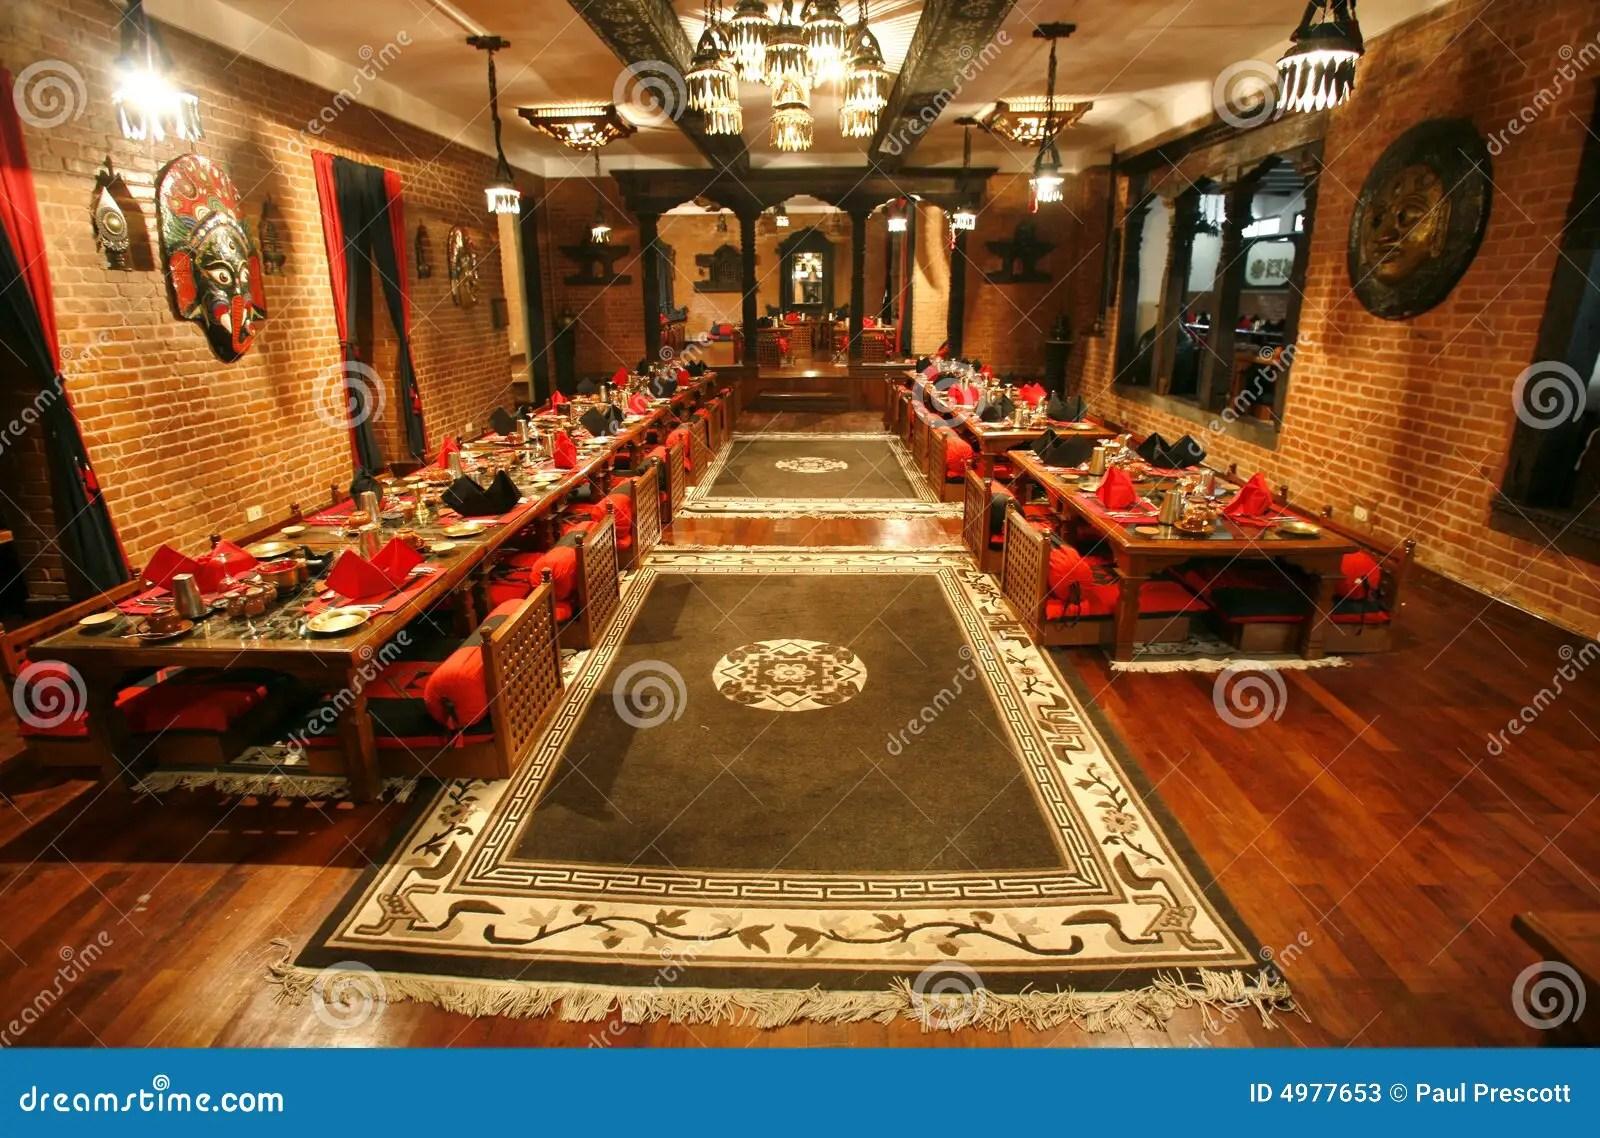 Chinese Restaurant Diningroom Stock Image Image Of